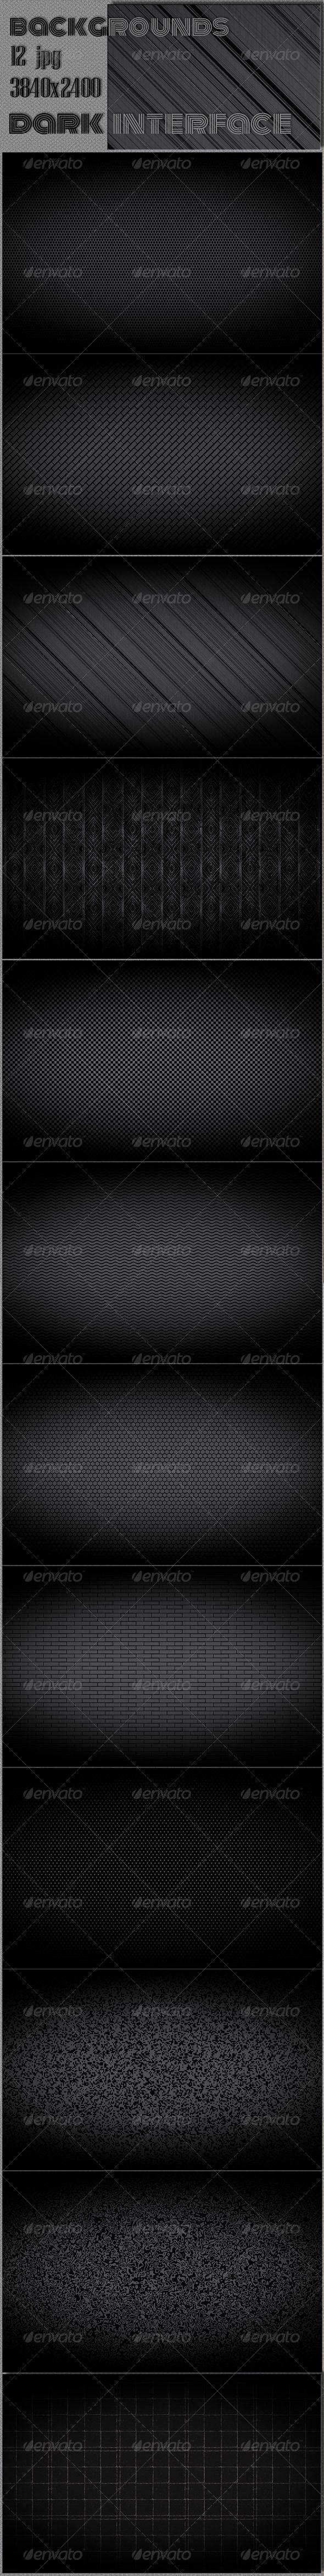 Dark Web Interface Pattern by cinema4design Dark Web Interface 4K Pattern Background 12 hi-res JPG images.3840脳2400, 300 DPI.